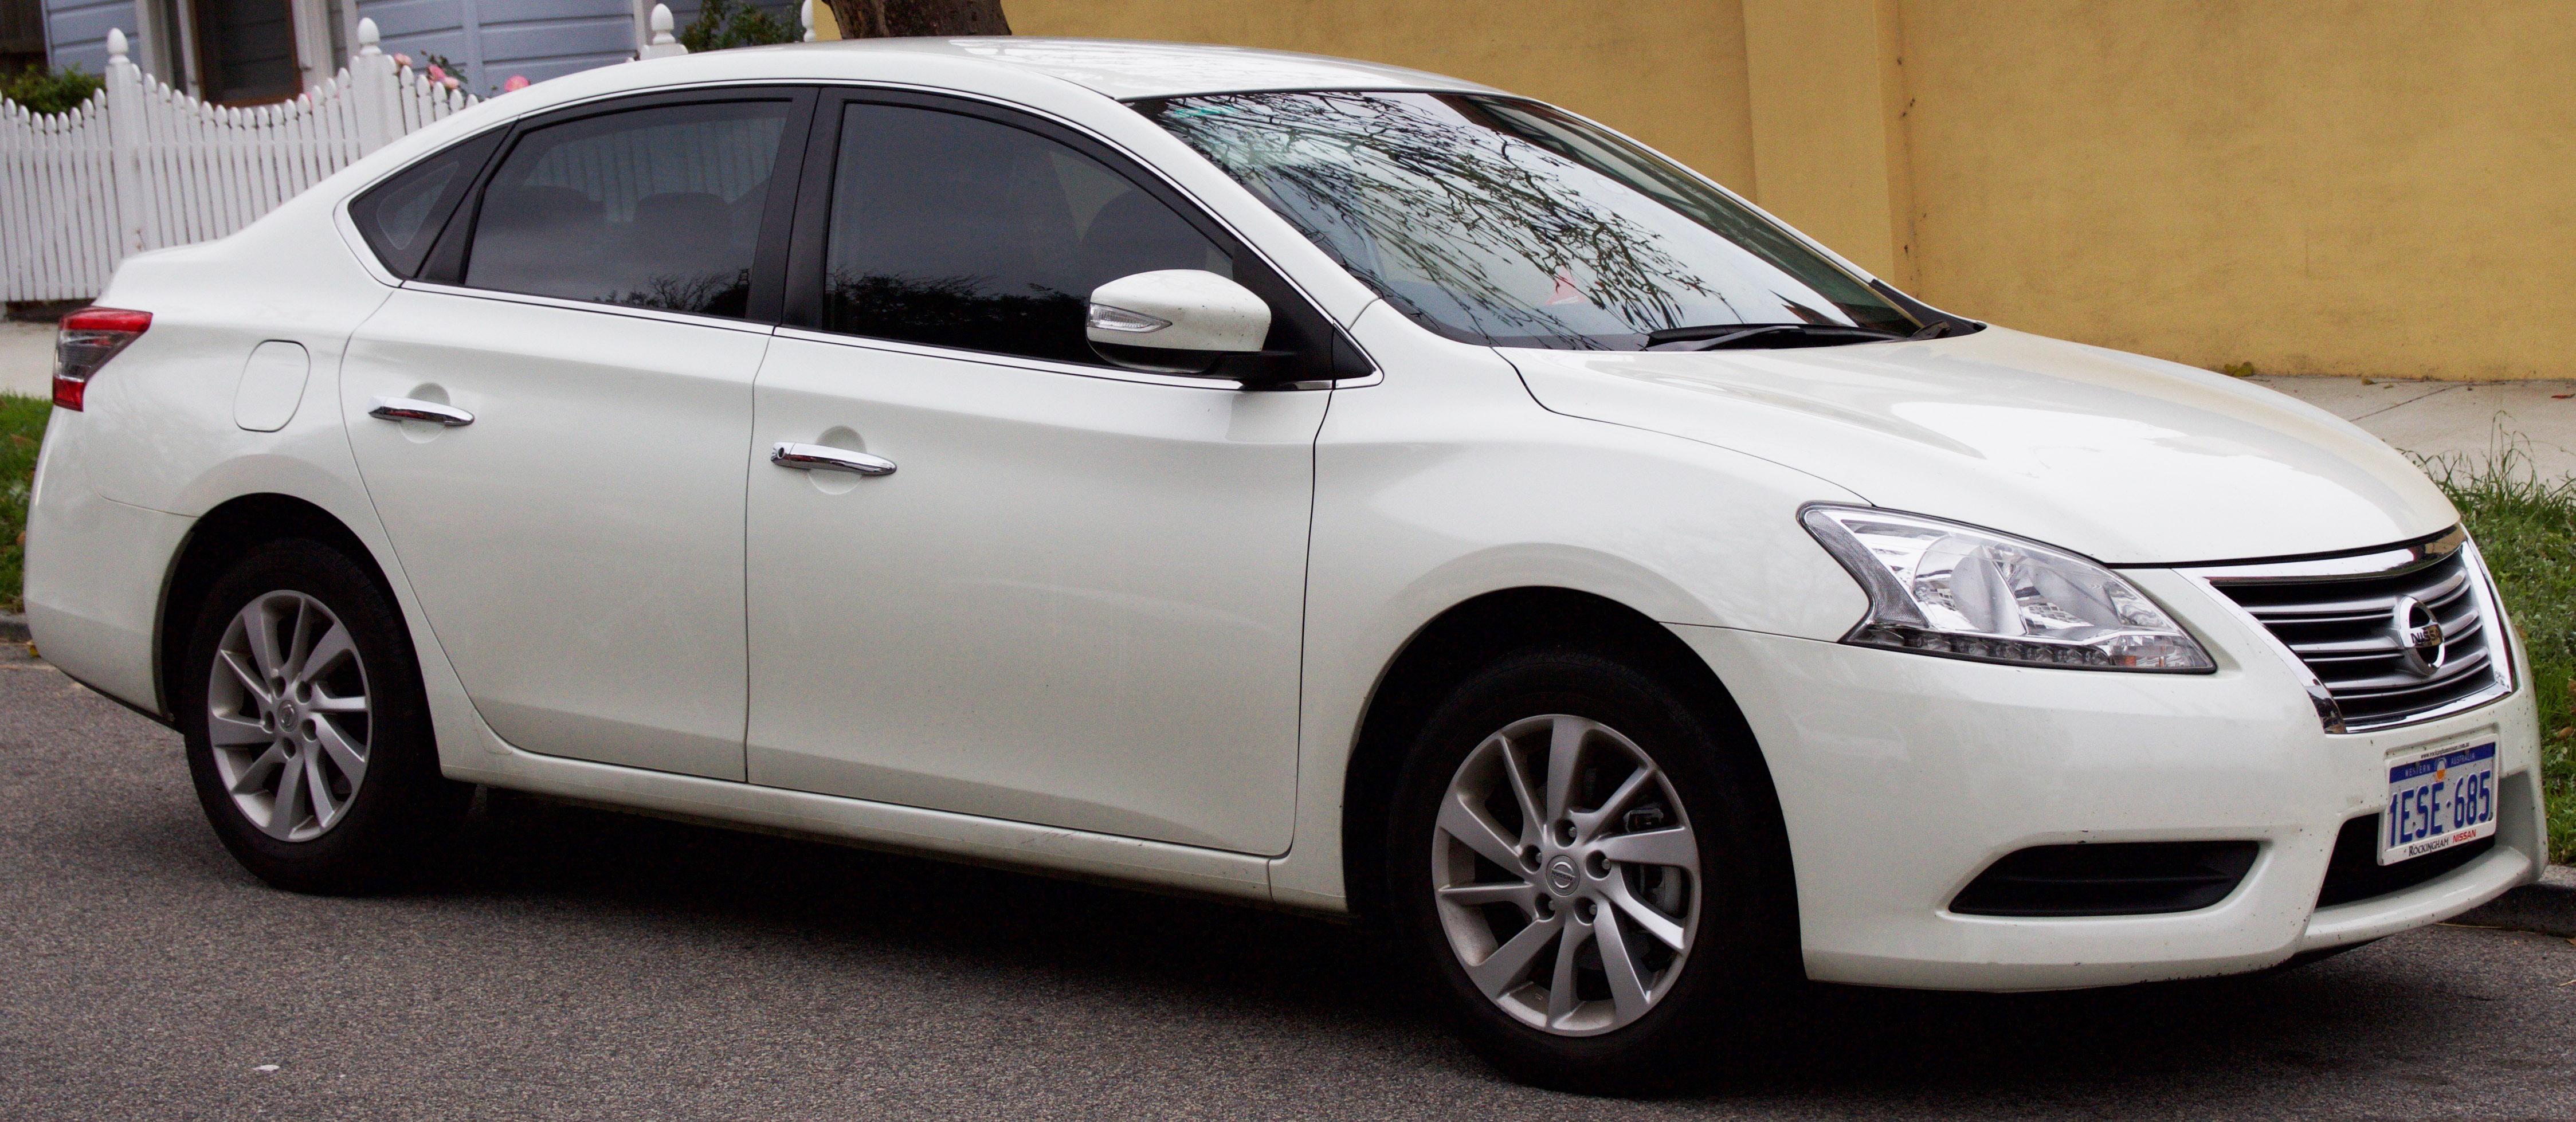 Nissan Bluebird Sylphy III (B17) 2012 - now Sedan #6